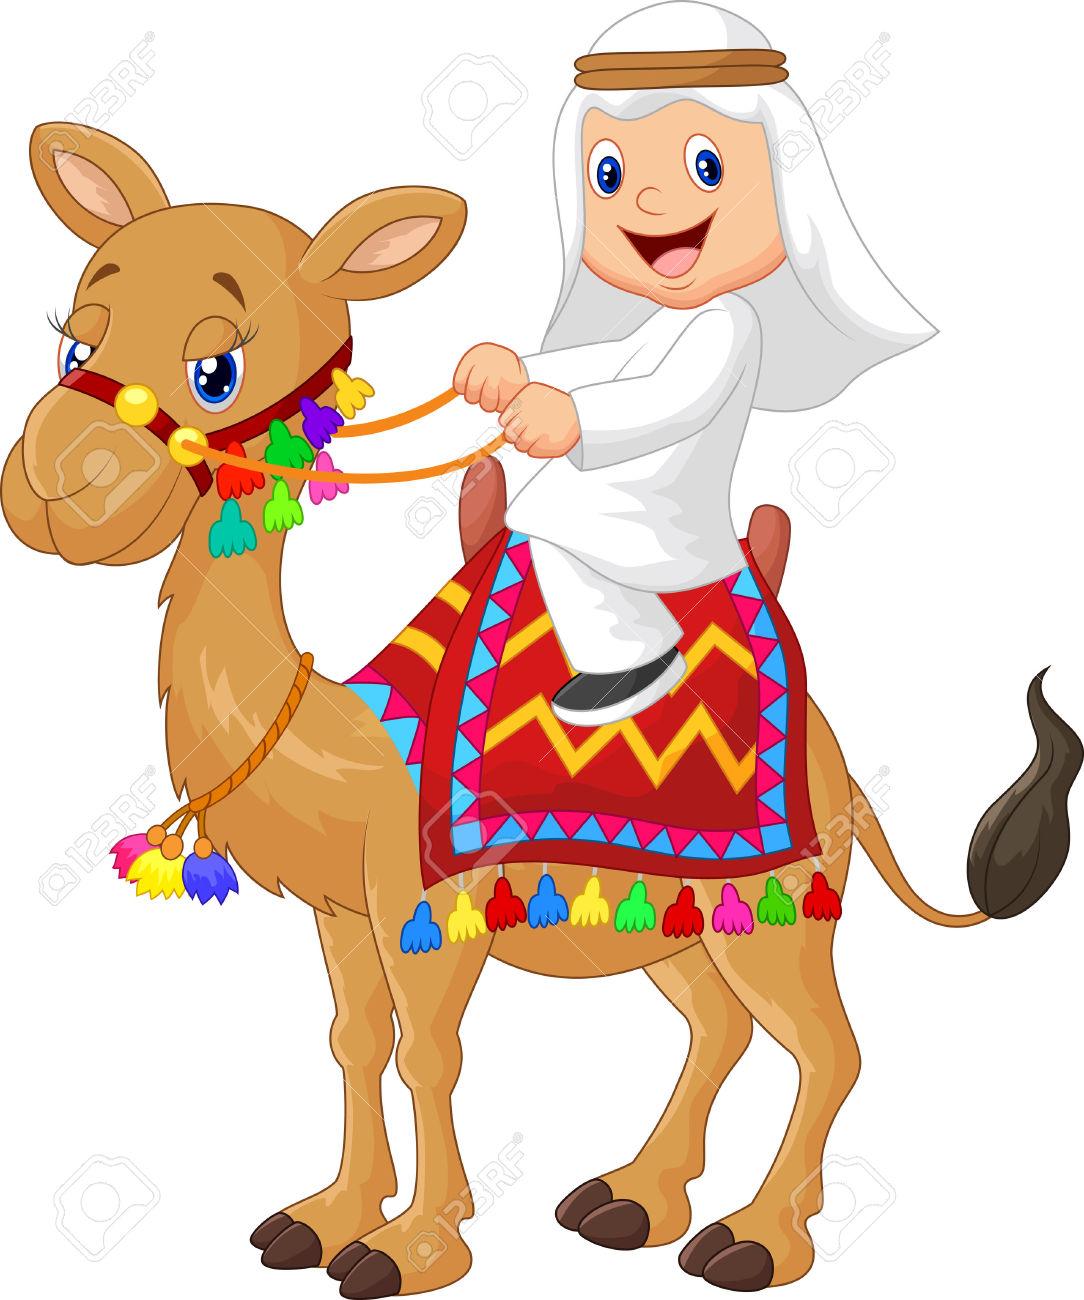 Arabic clipart kids svg freeuse download 2,142 Desert Arab Stock Vector Illustration And Royalty Free ... svg freeuse download